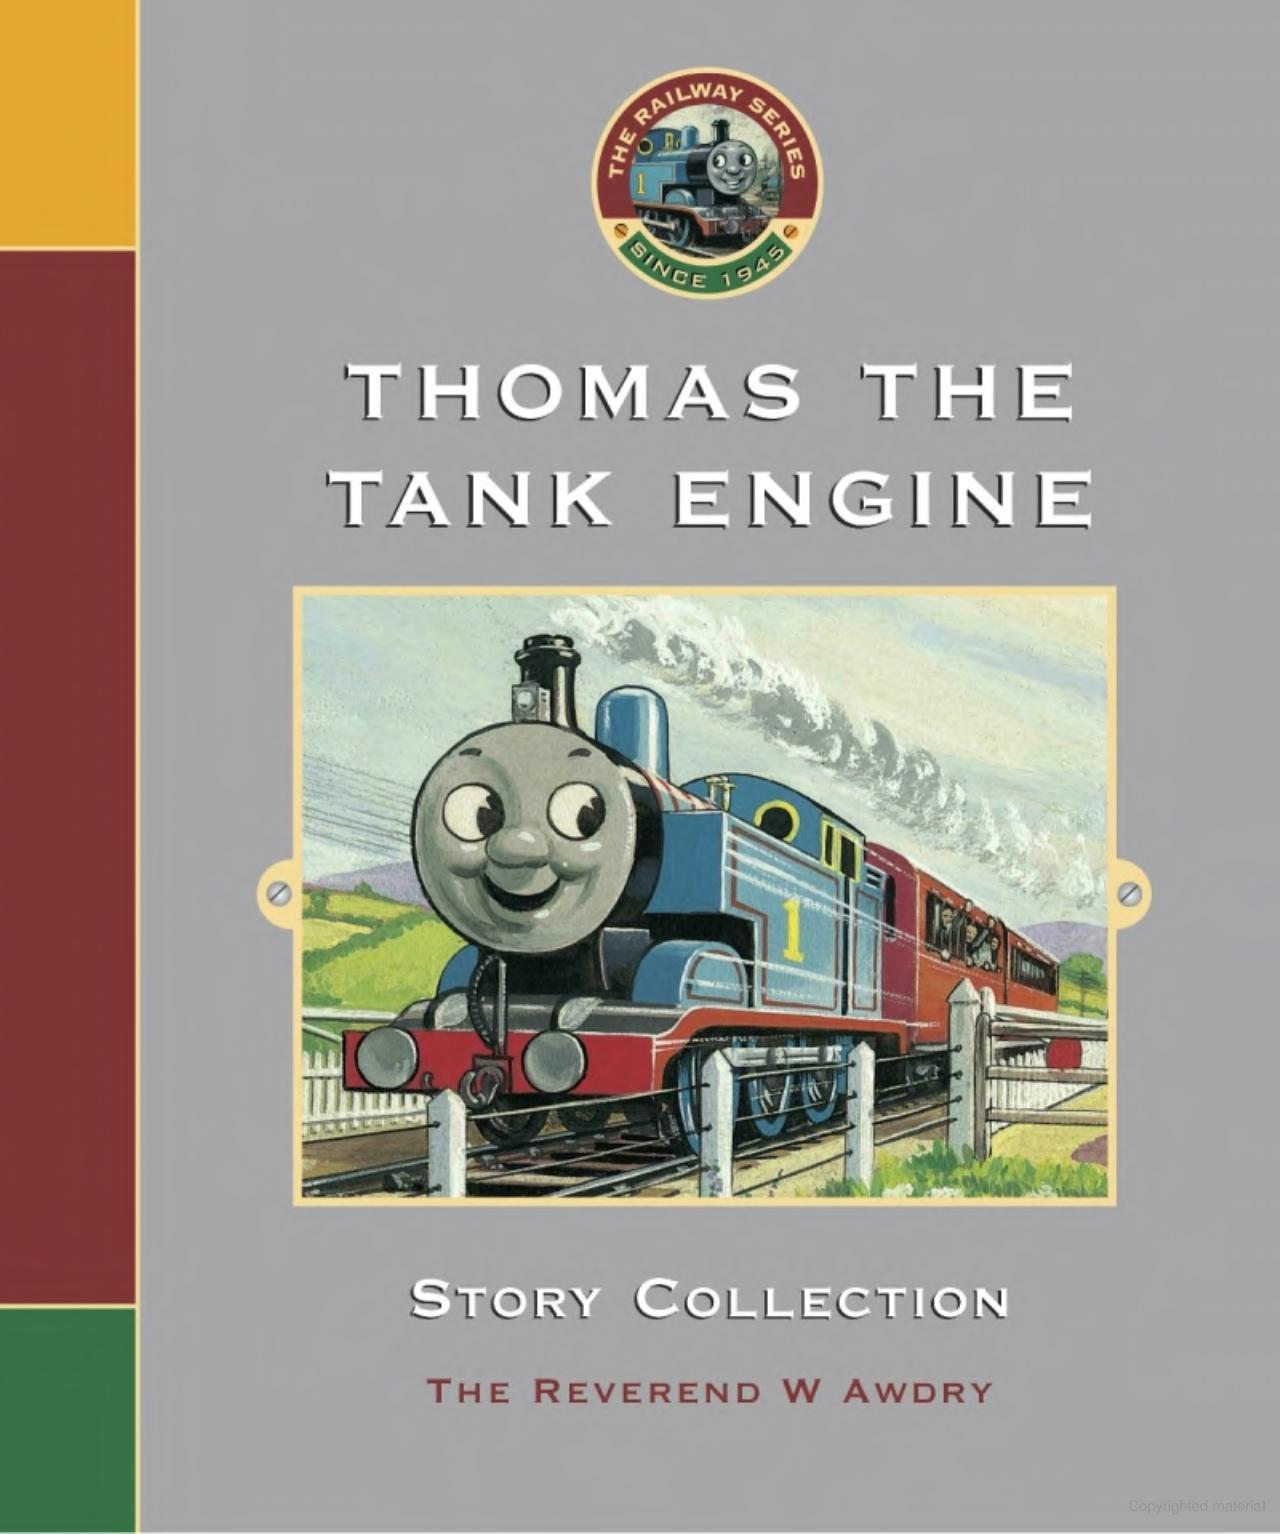 File:ThomasthetankEngine-StoryCollection.jpg